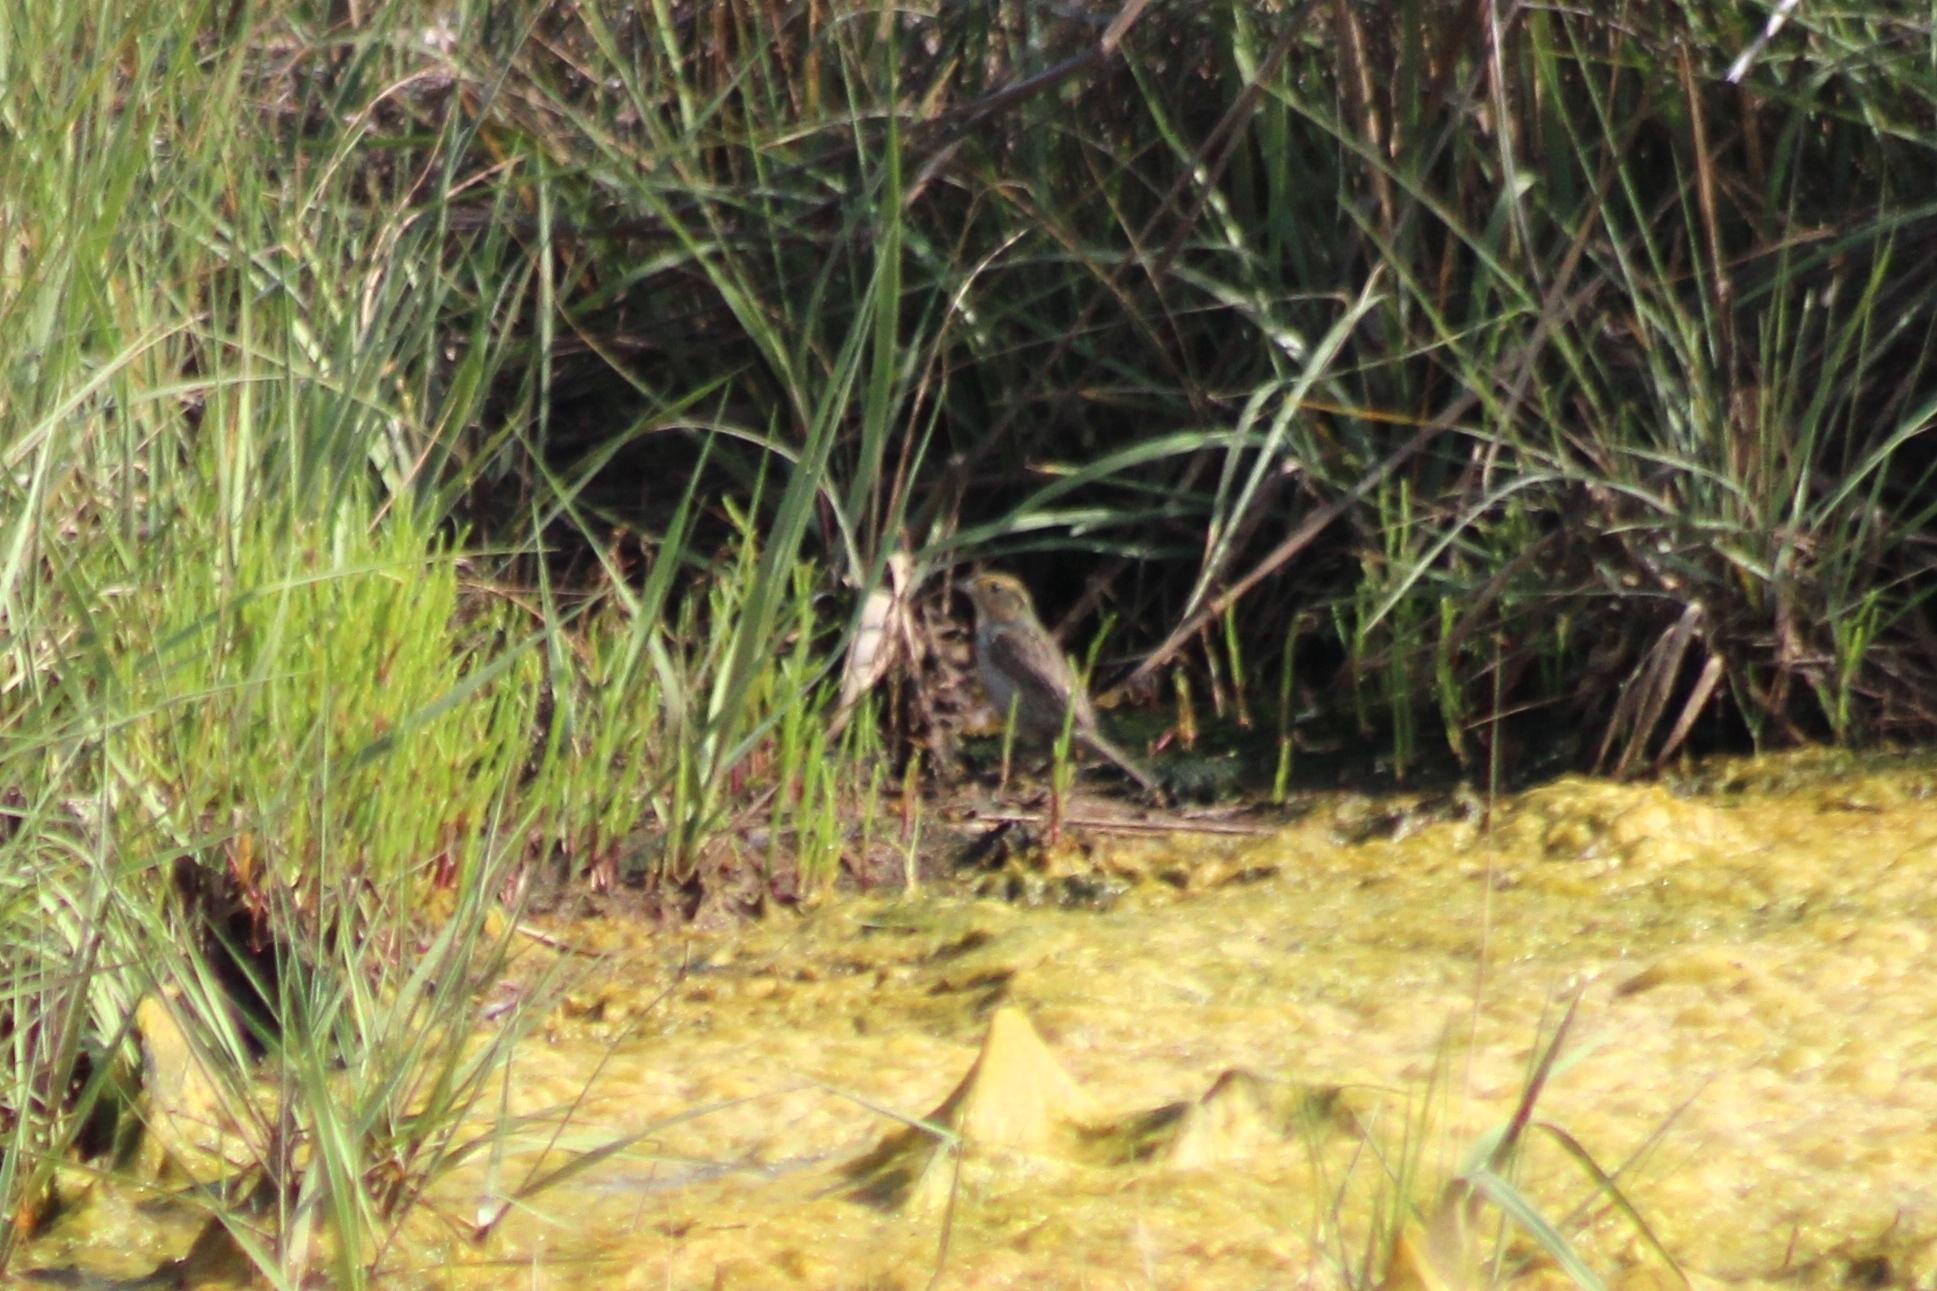 Image of saltmarsh sparrow